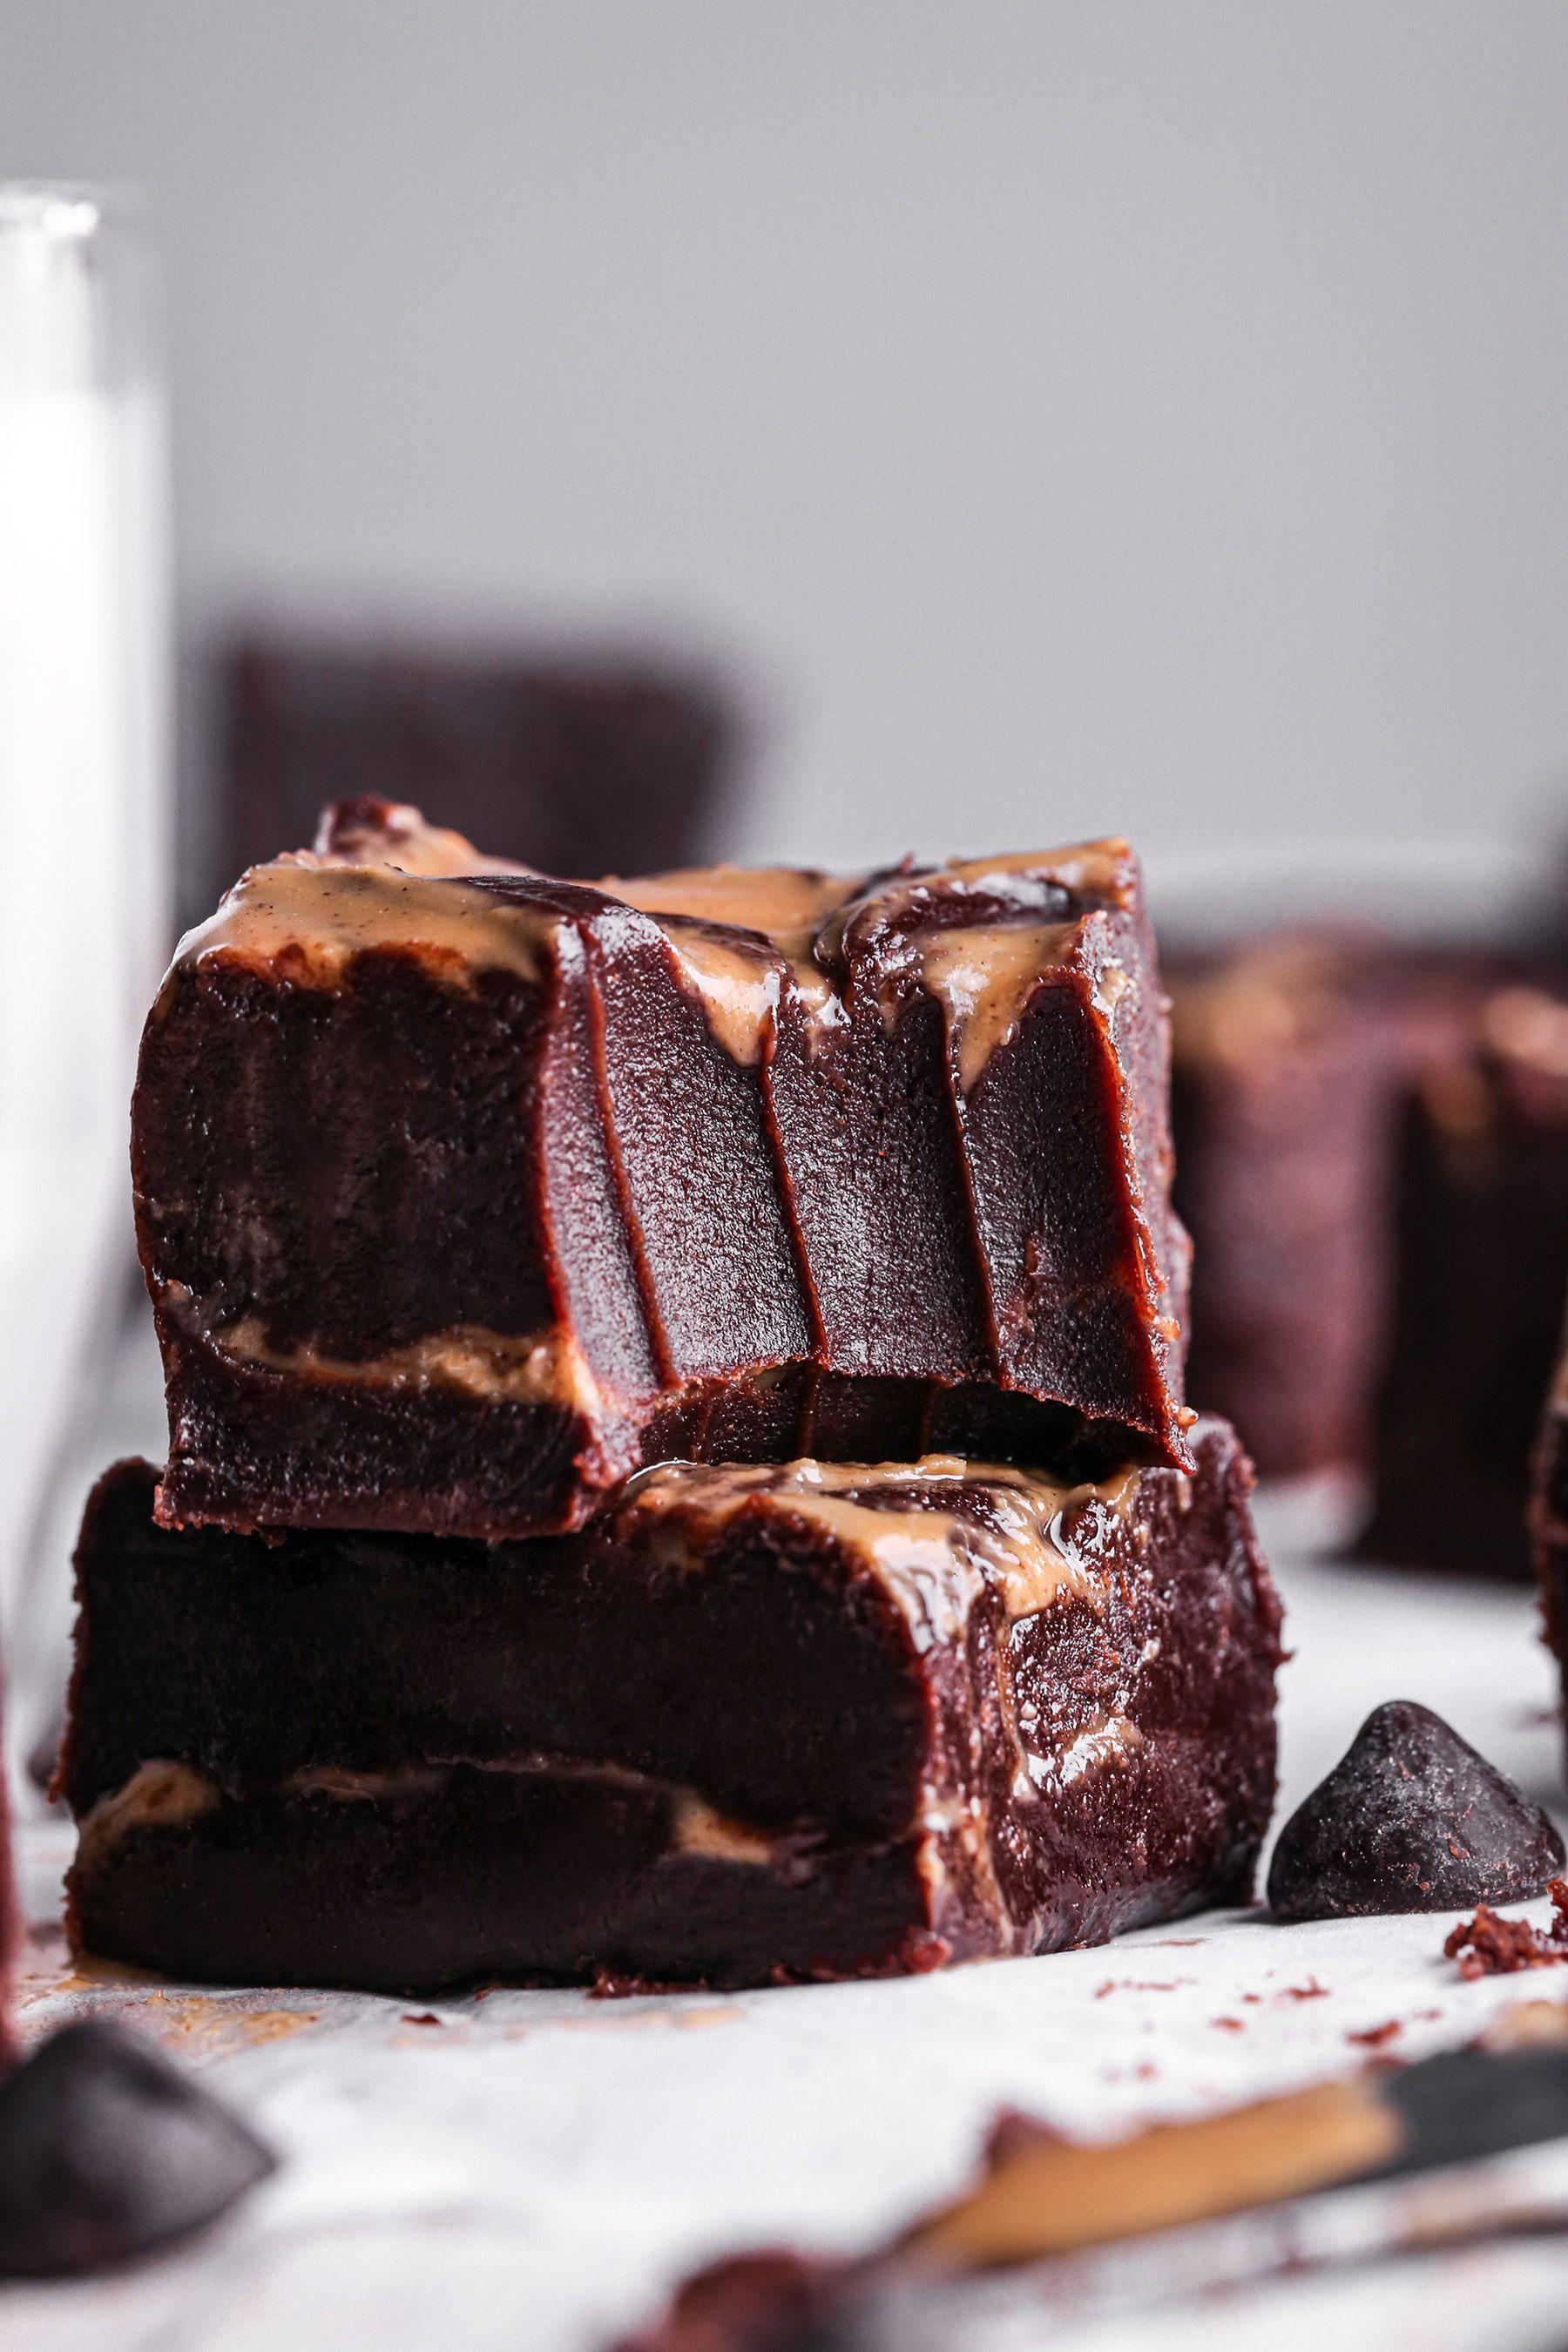 Chocolate and Peanut Butter Swirl Fudge